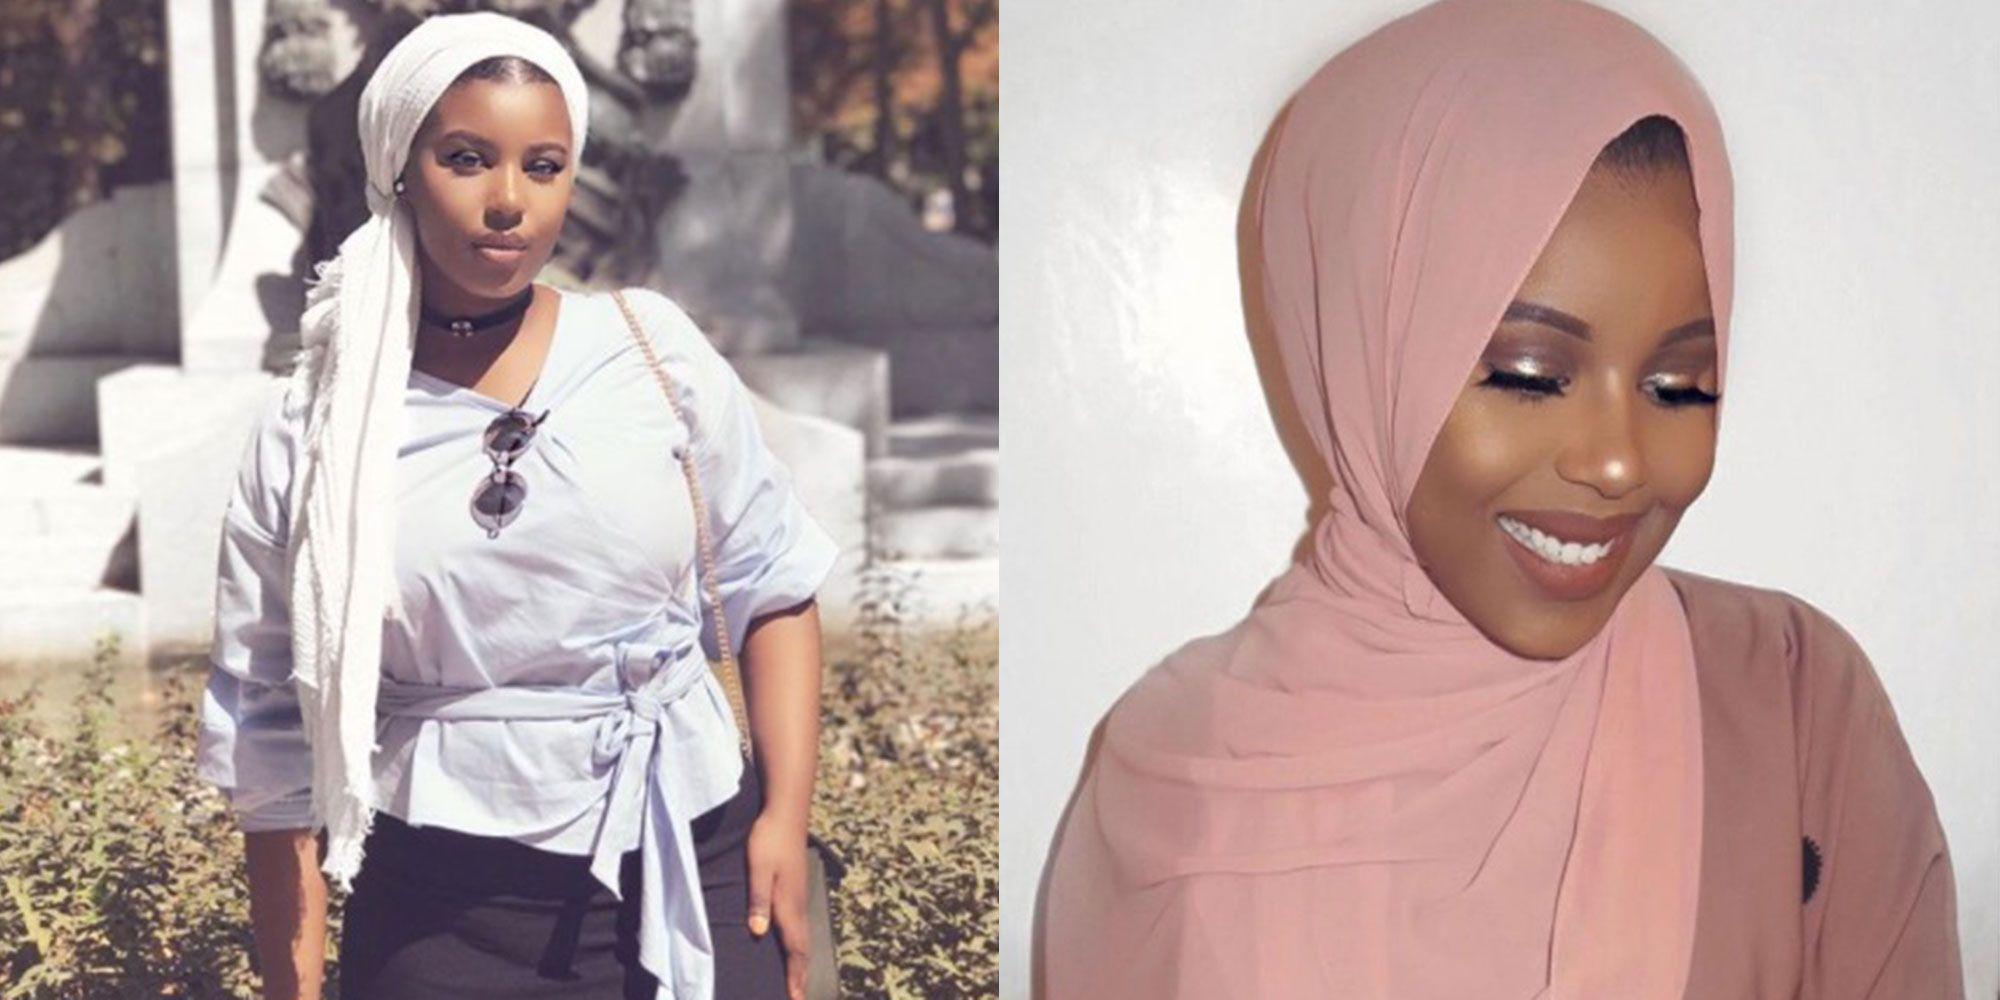 Dating a muslim woman